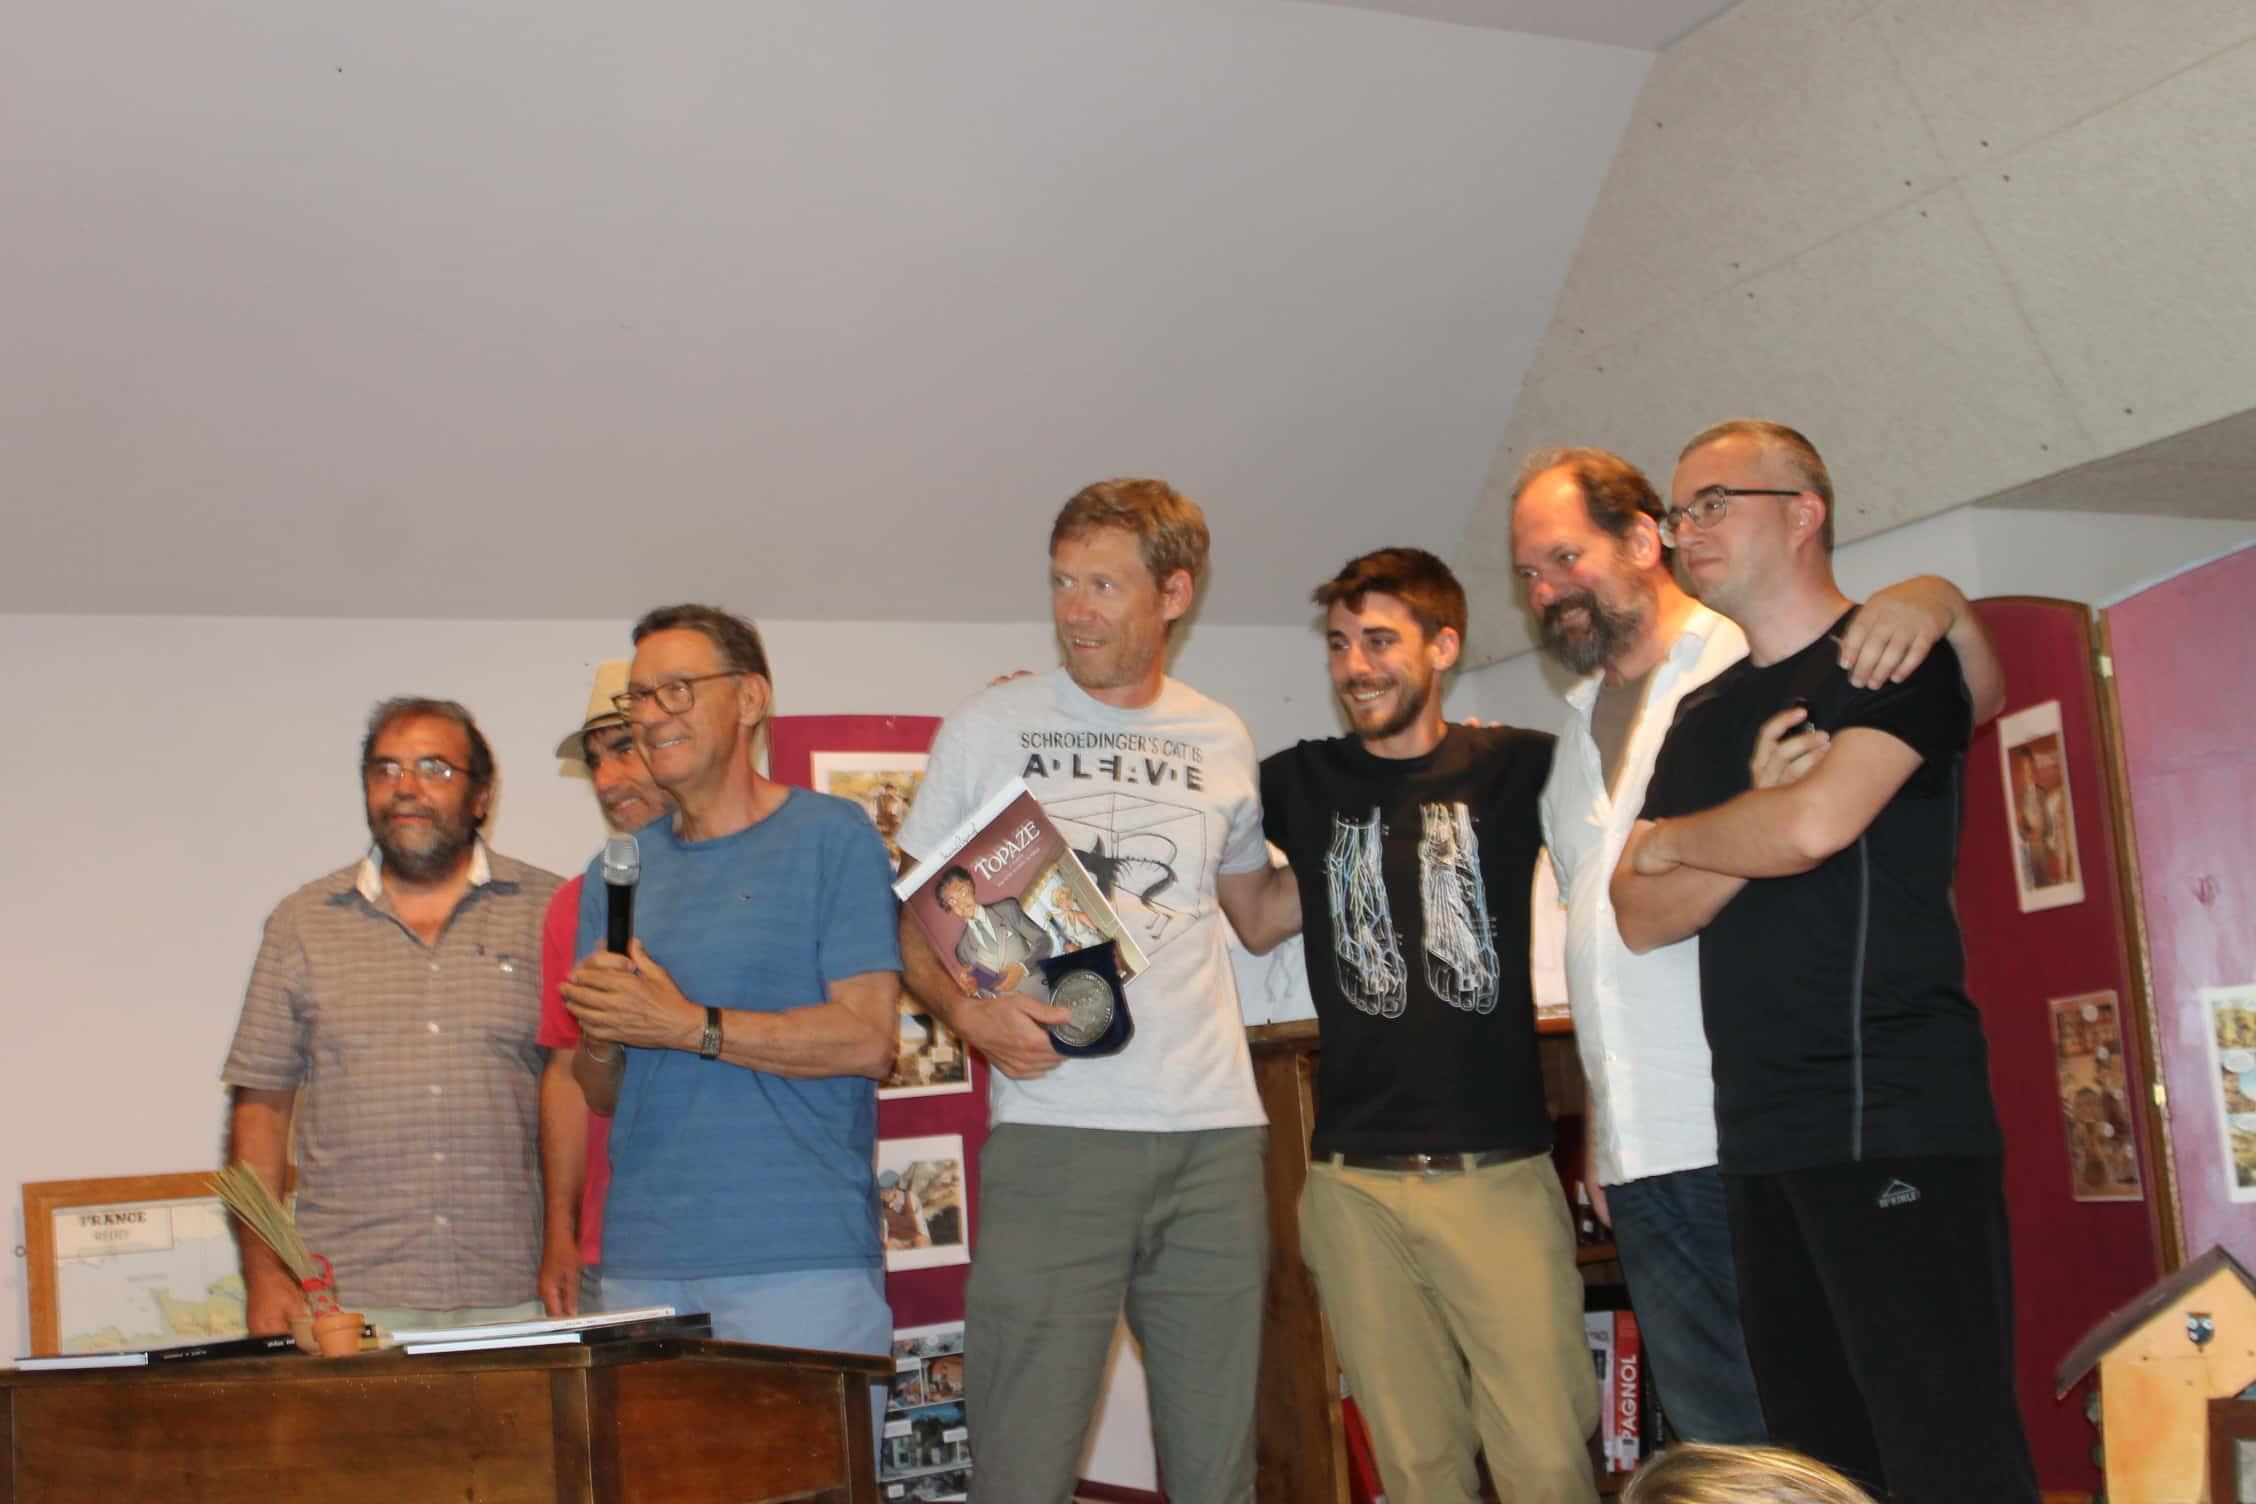 Festival de Sainte-Enimie, Eric Hübsch grand prix 2017 pour Topaze